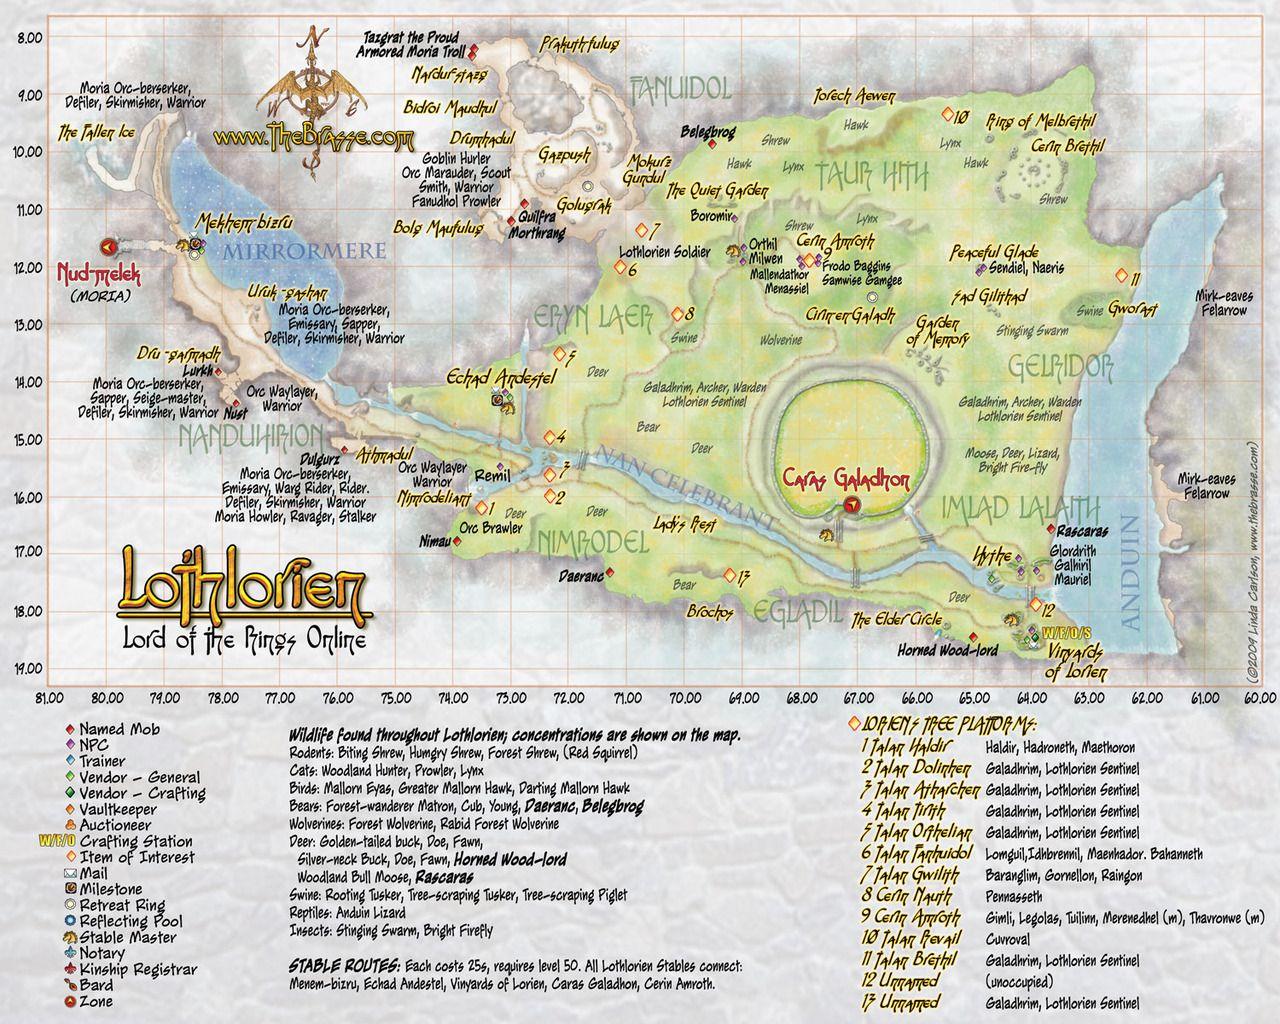 lothlorien | Maps | Middle earth map, Tolkien map, Fantasy map